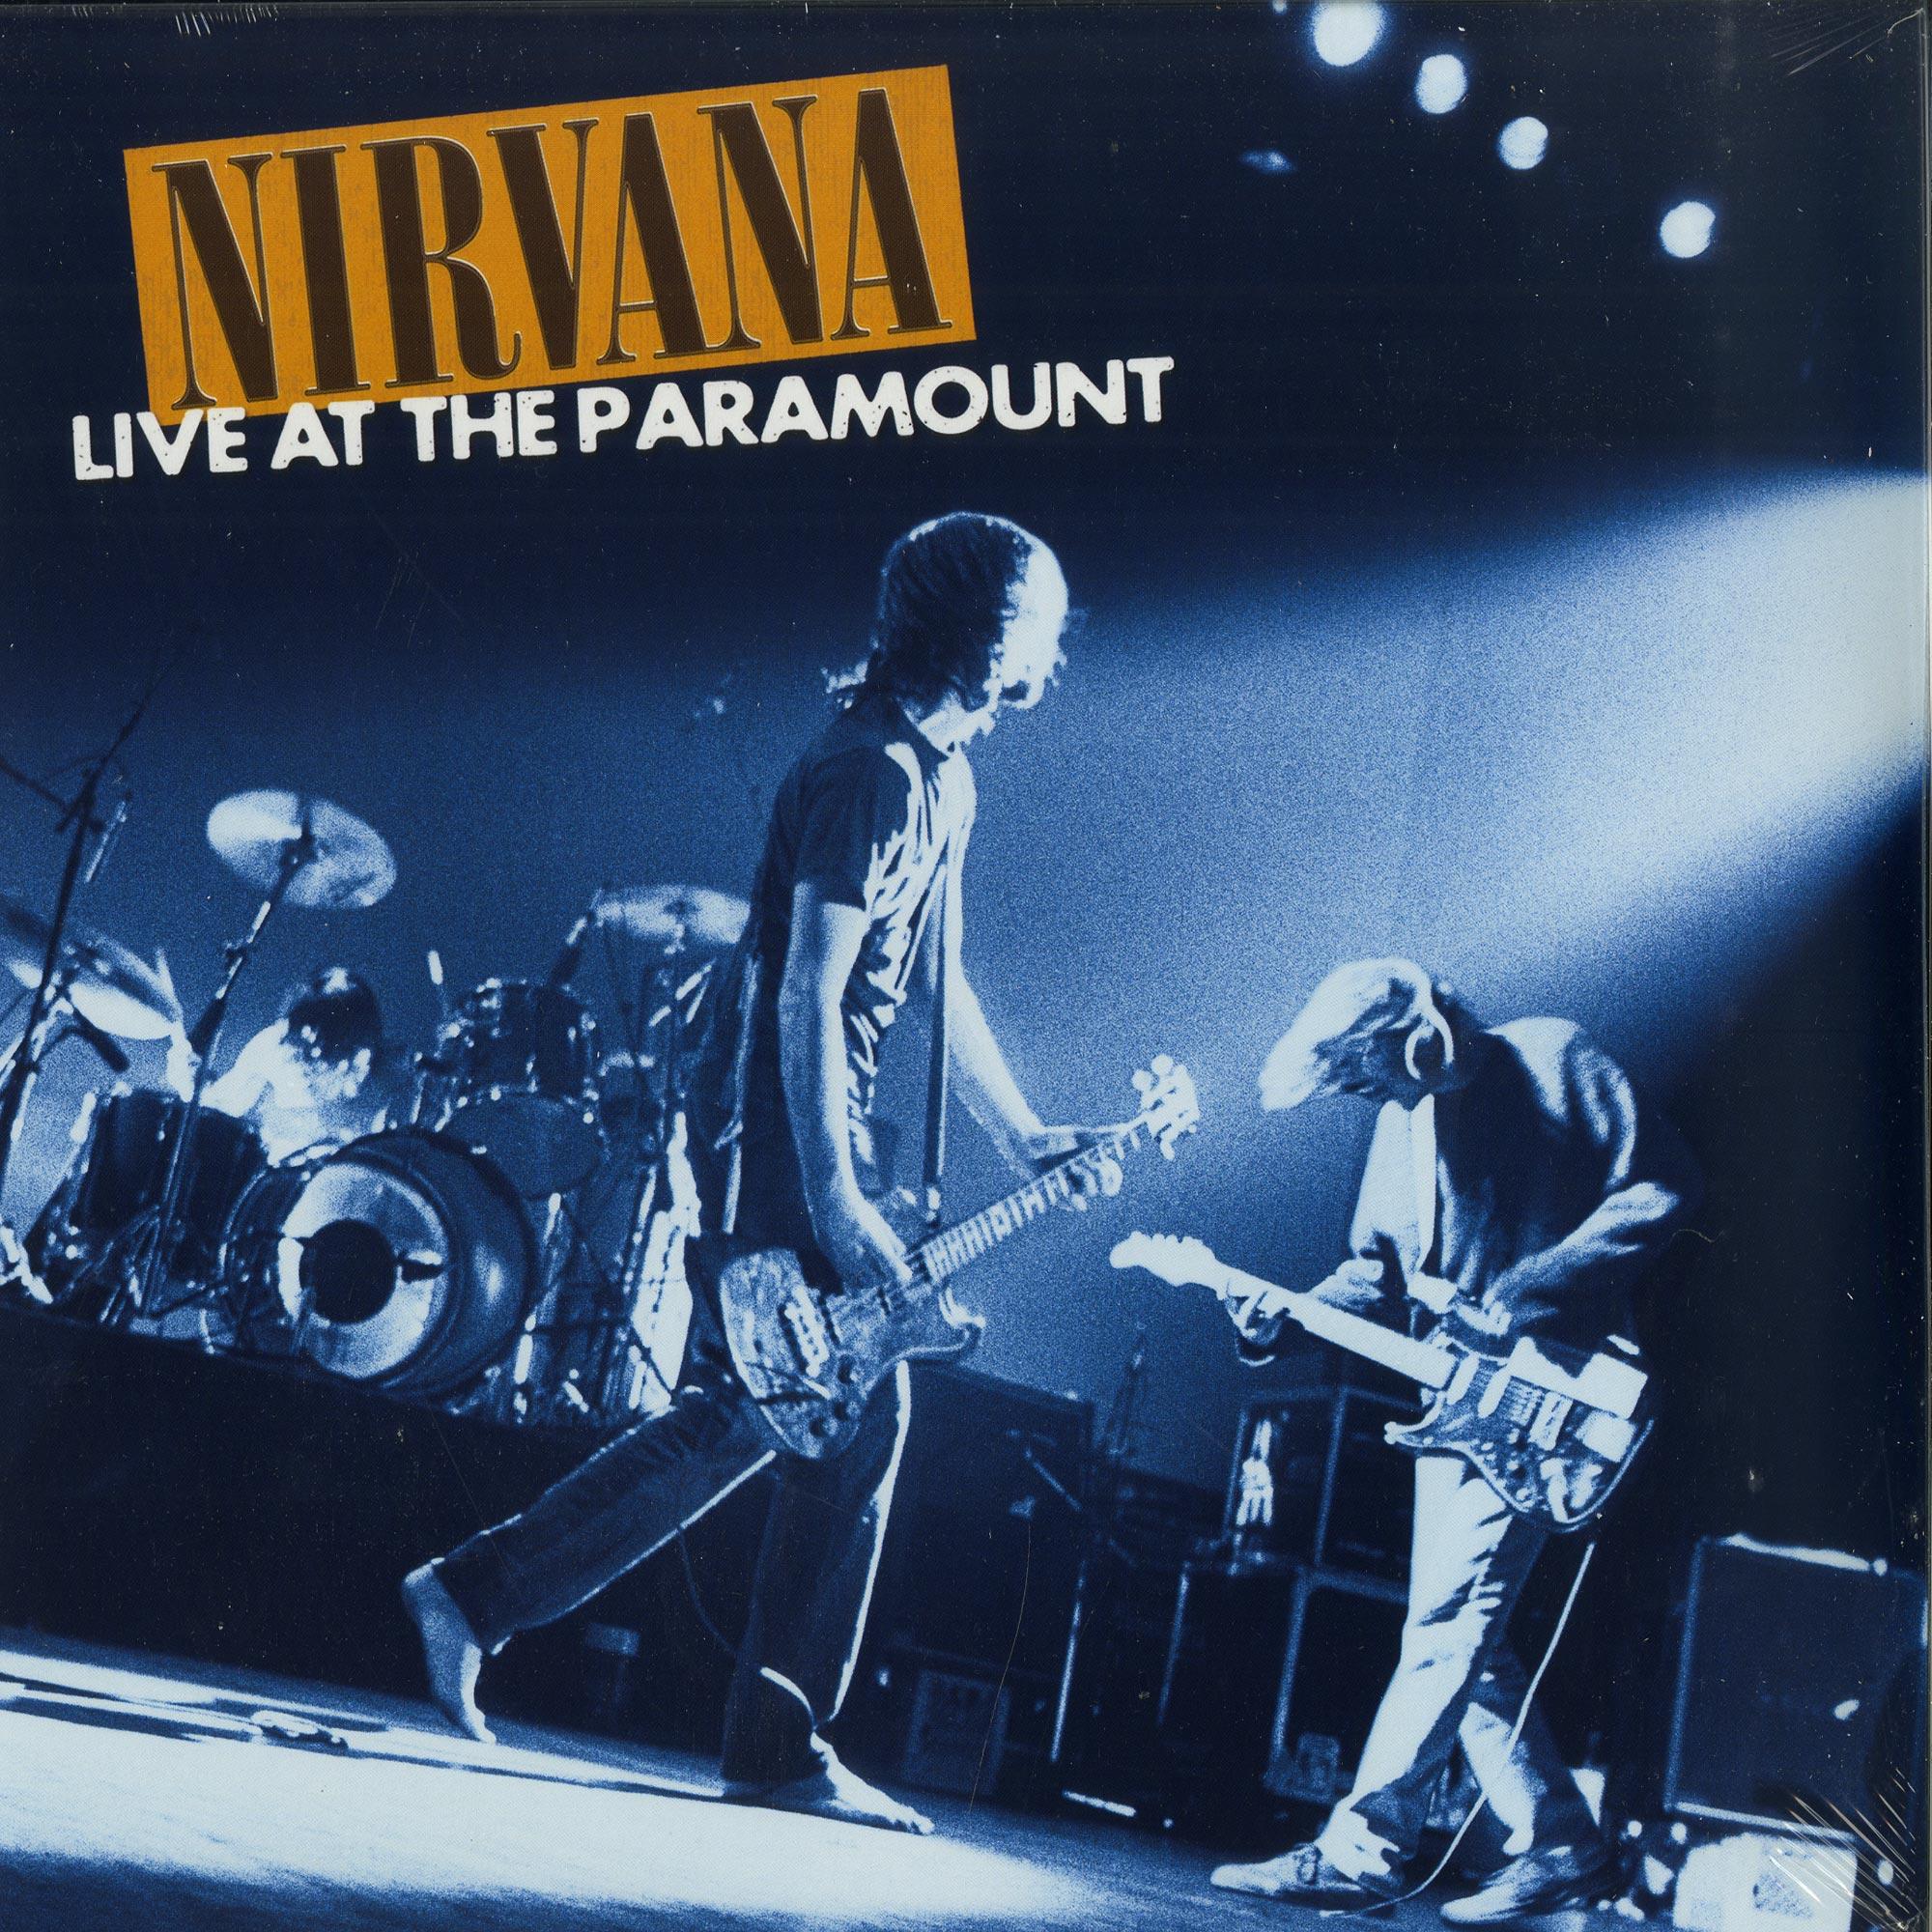 Nirvana - LIVE AT THE PARAMOUNT